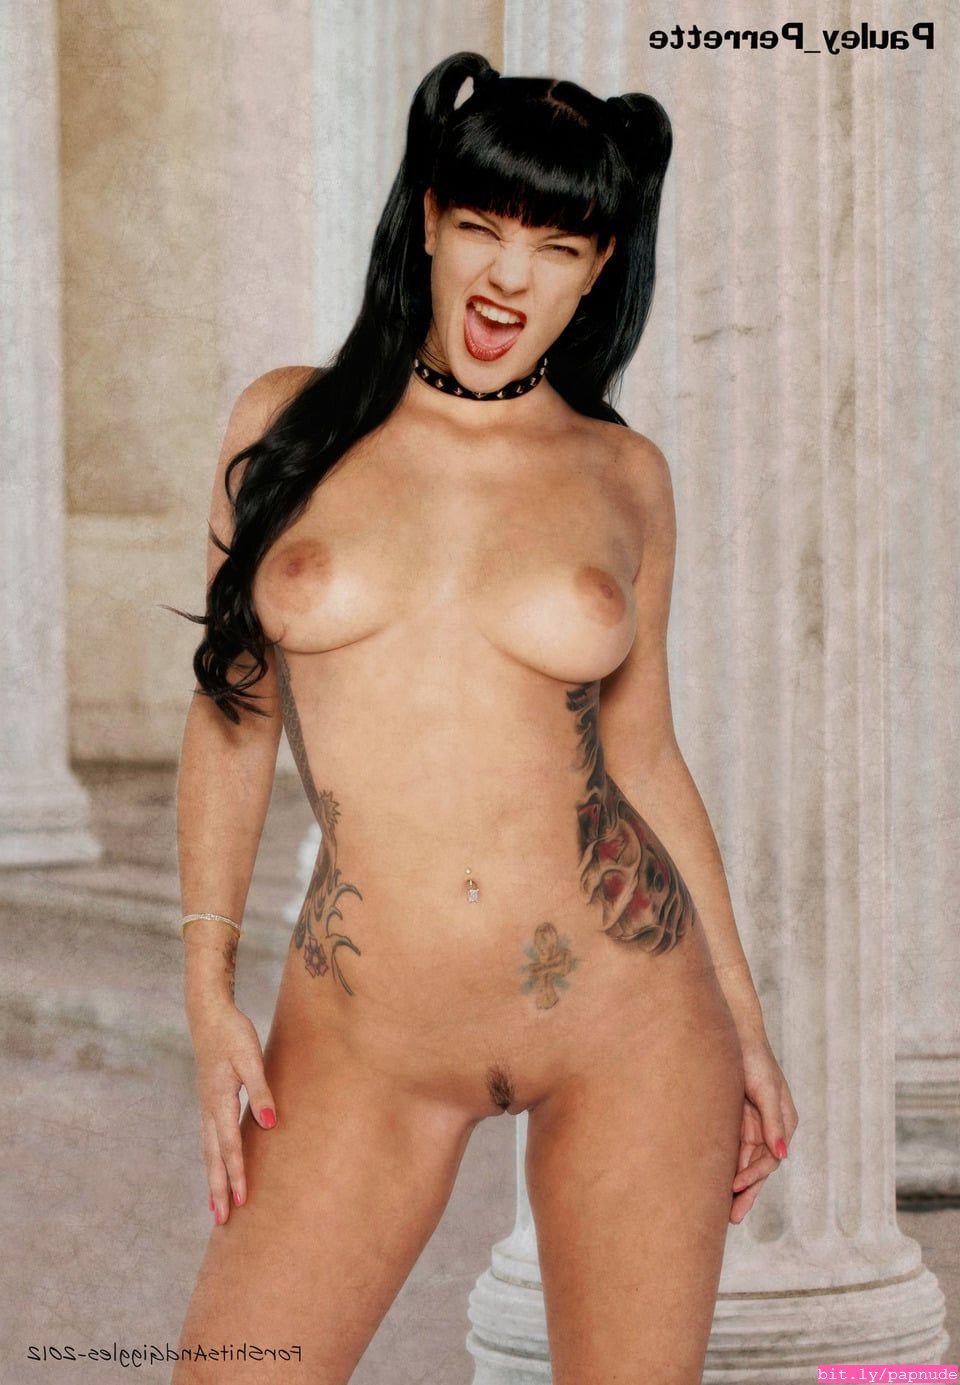 Perrette naked pauley Ncis Pics